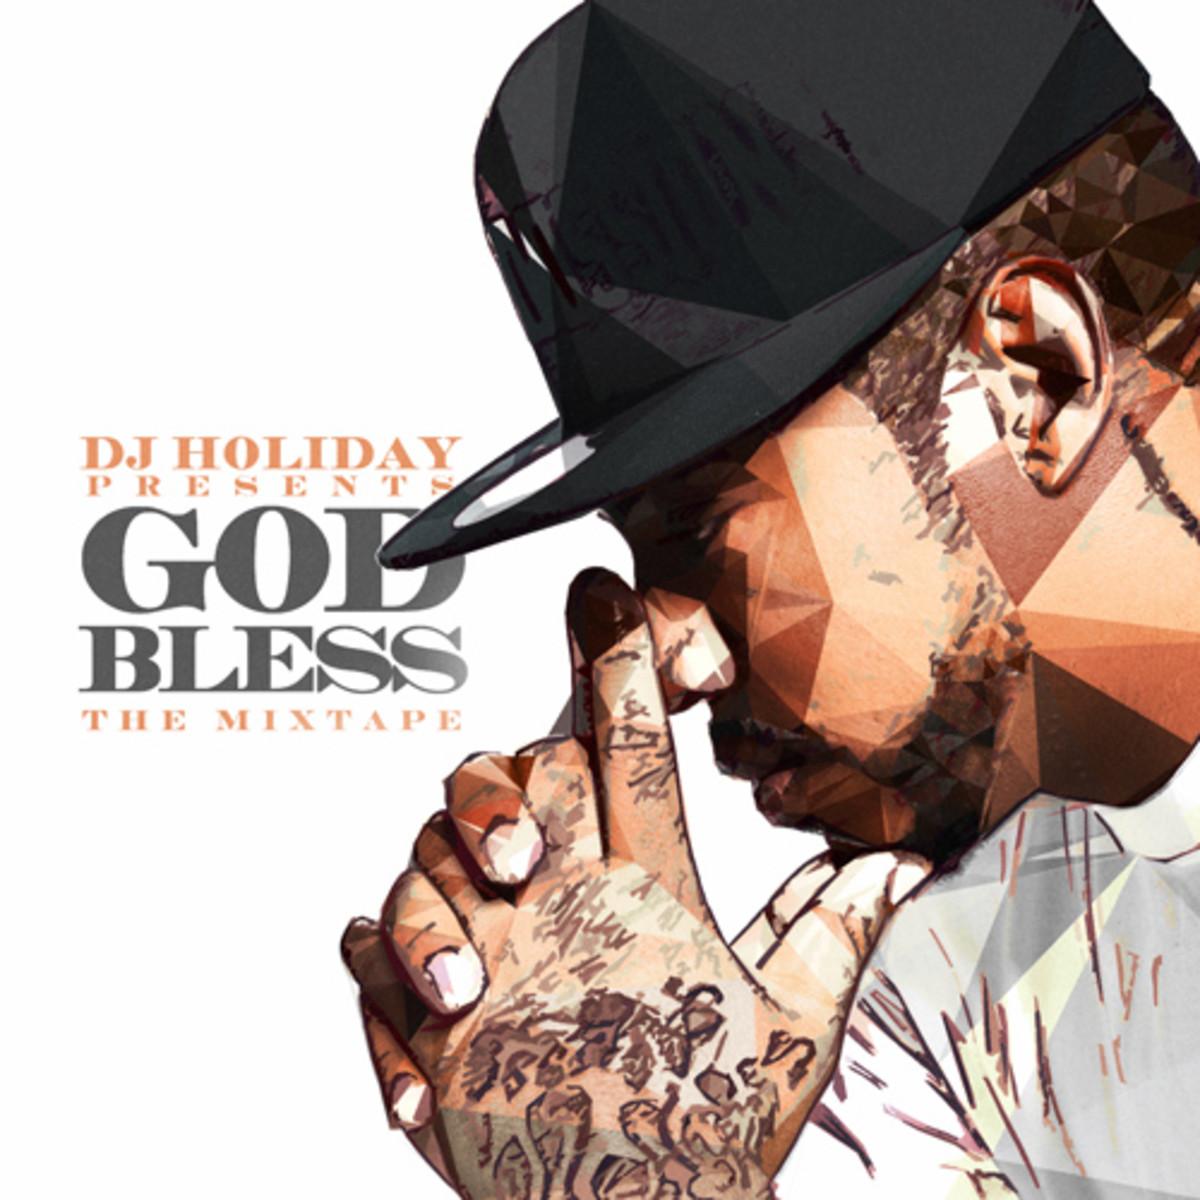 dj-holiday-god-bless-the-mixtape.jpg